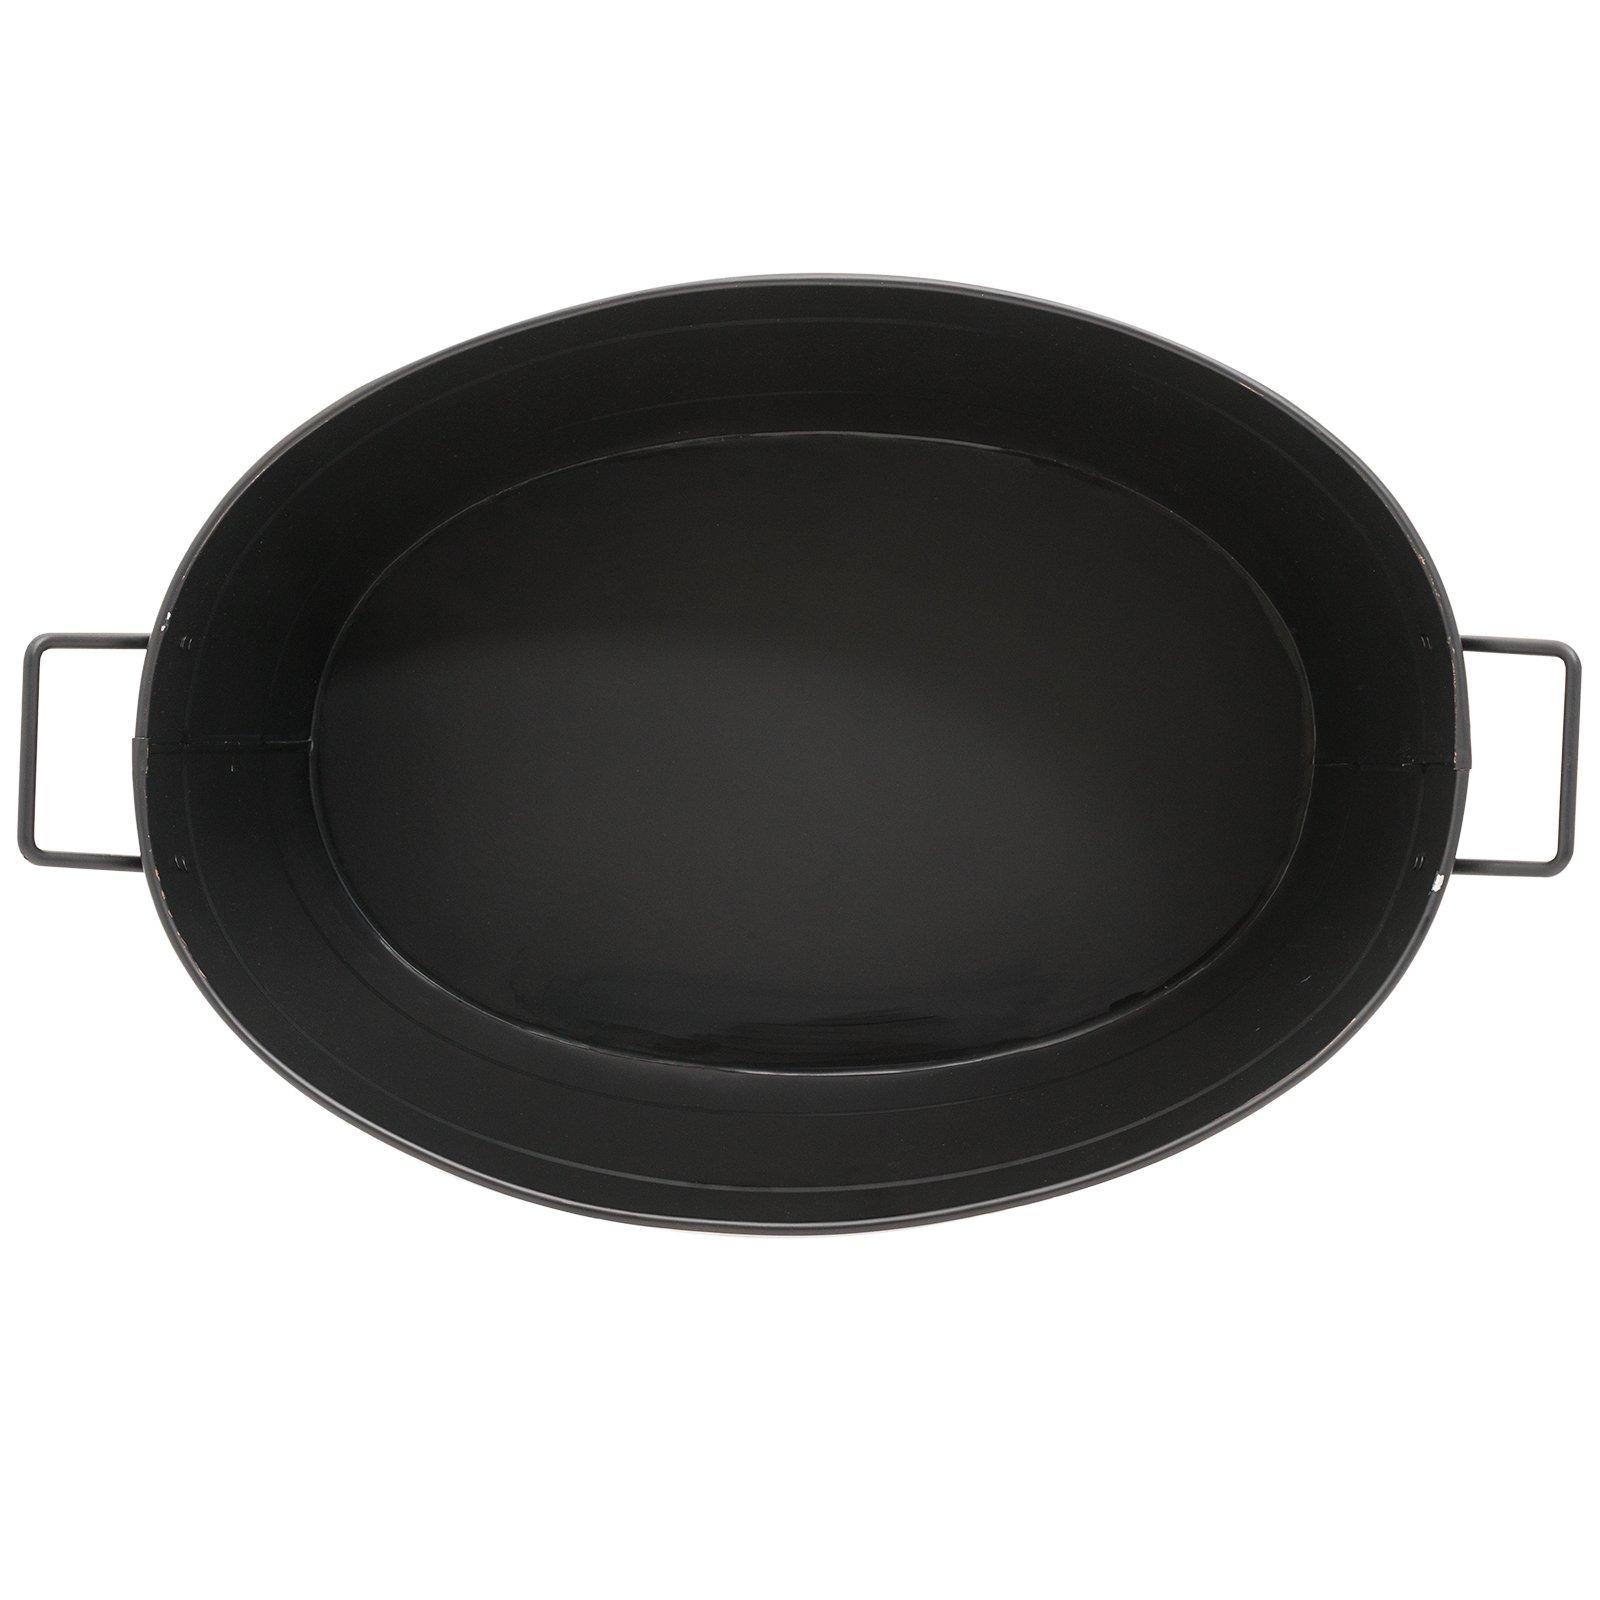 Achla Designs Black Oval Galvanized Steel Tub by Minuteman International (Image #5)